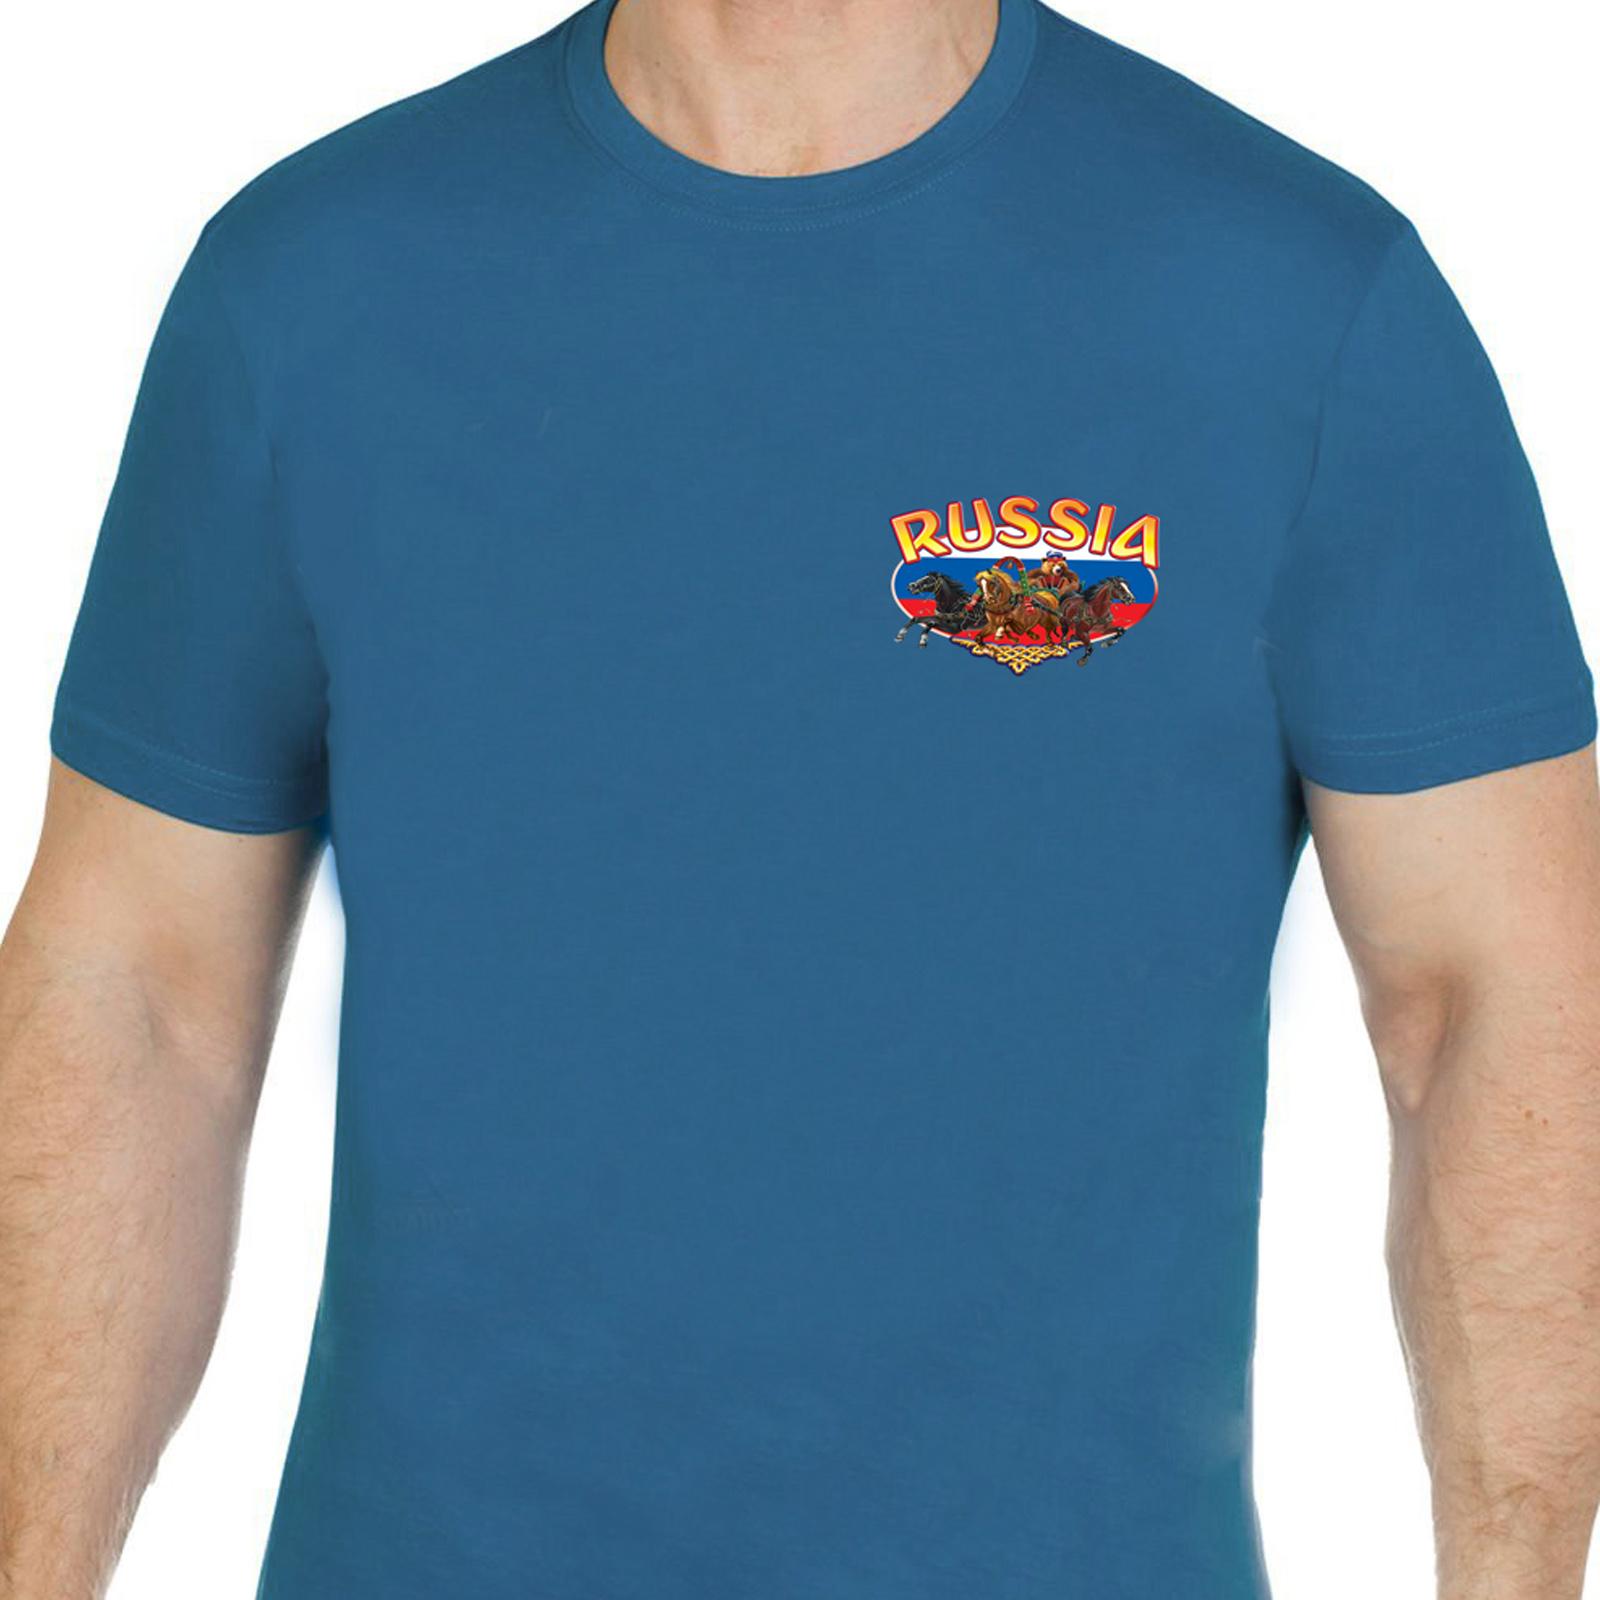 Эффектная мужская футболка Россия